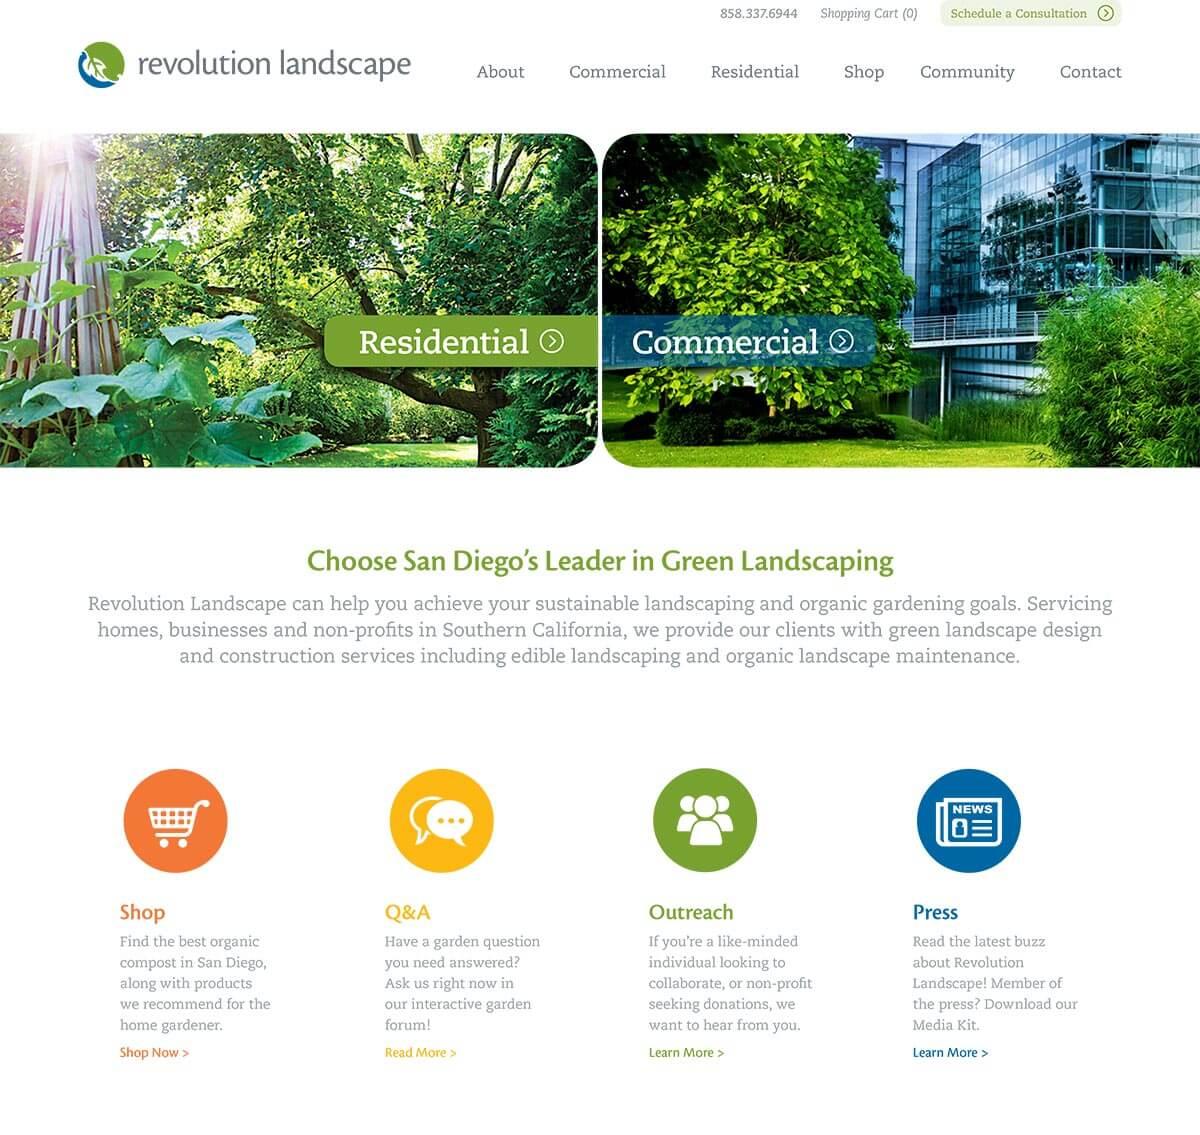 B2C + B2B Website Design & Marketing for Landscaping Firm